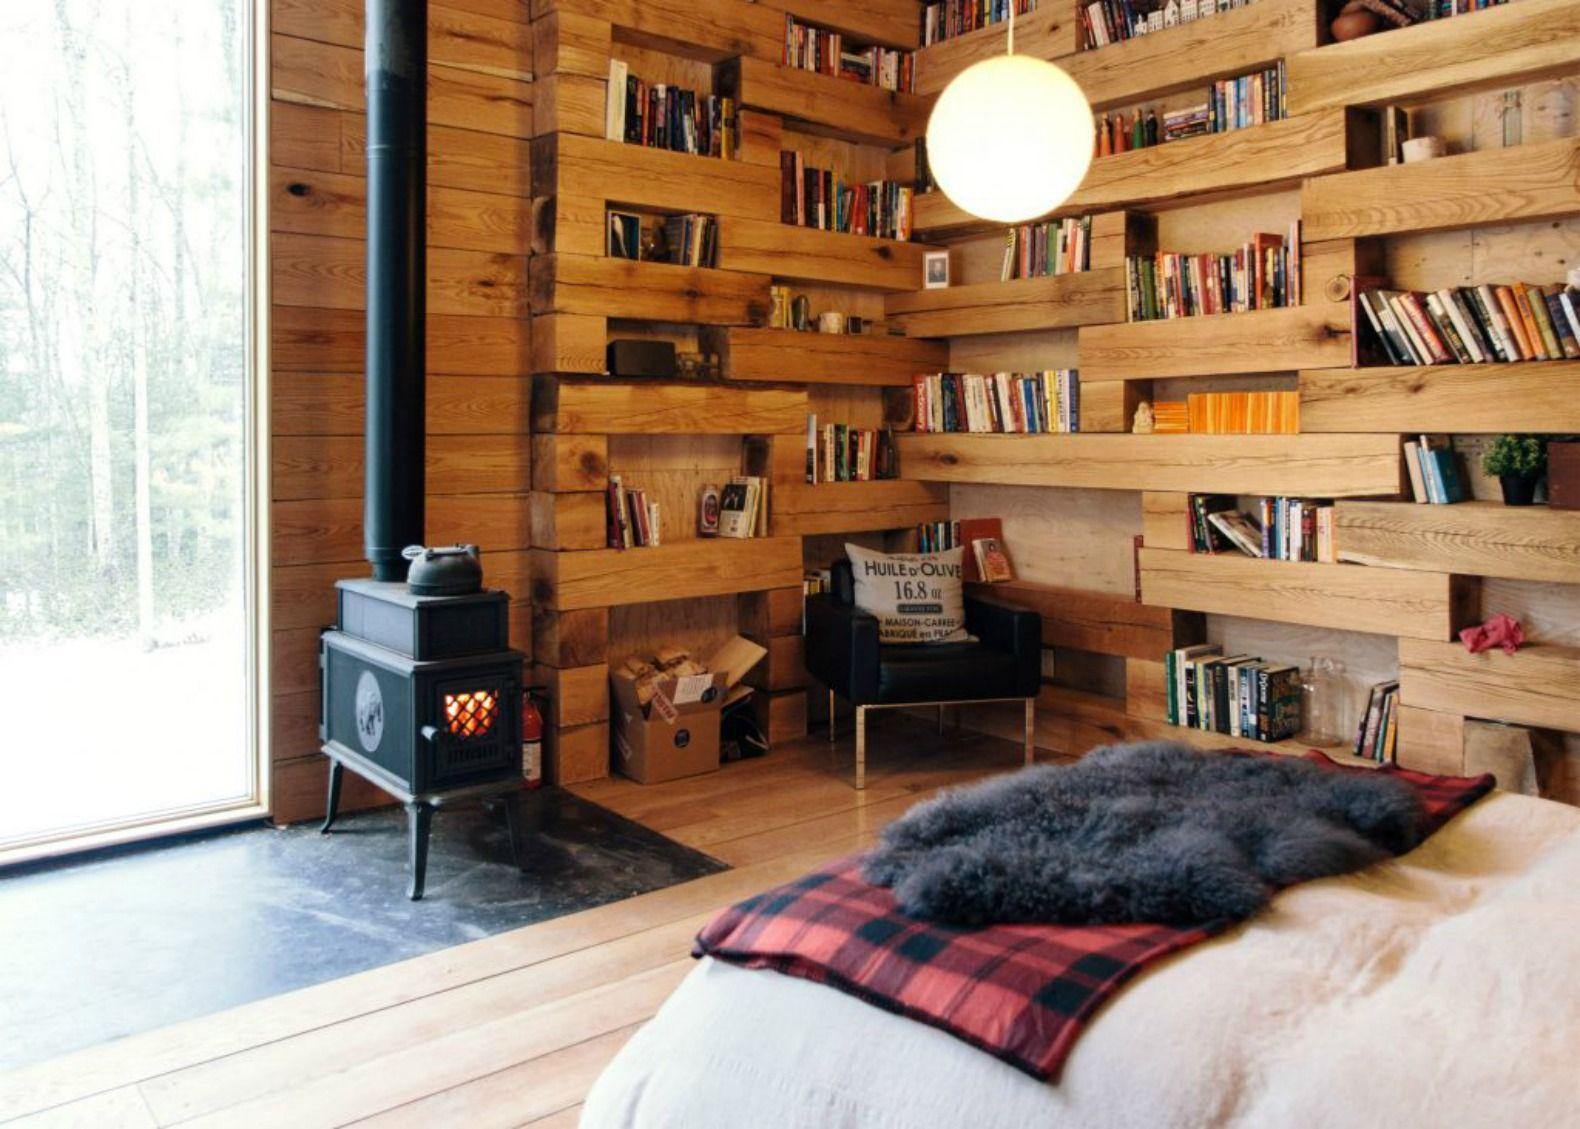 Studio Padron Studio Padron Library Cabin Hemmelig